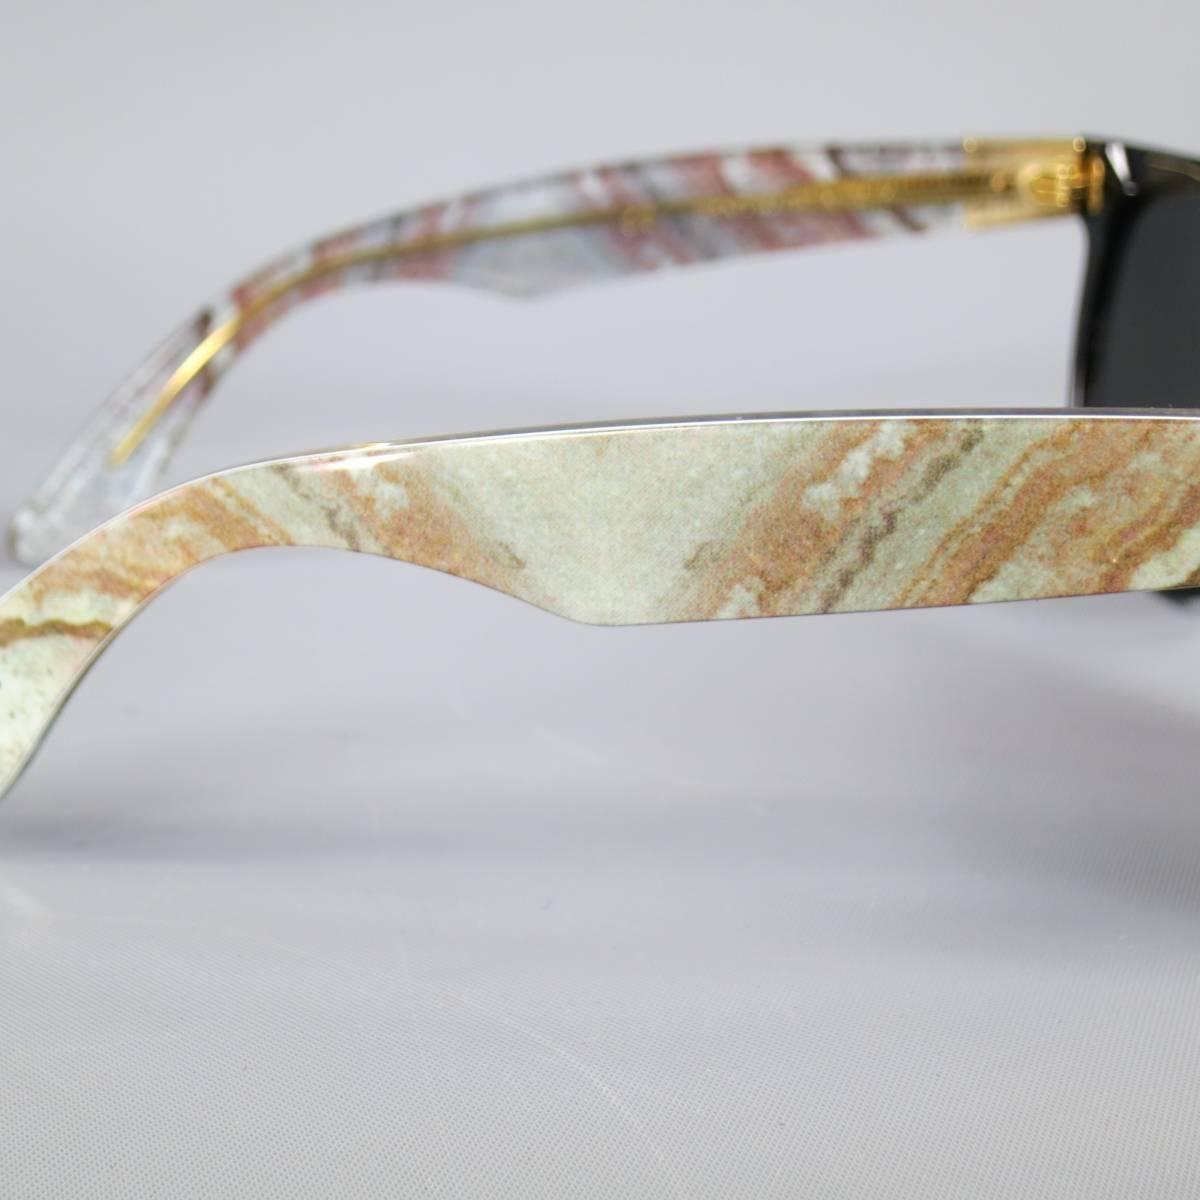 648be969eb RETRO SUPER FUTURE Black and Grey Marble Arm Wayfarer Sunglasses at 1stdibs